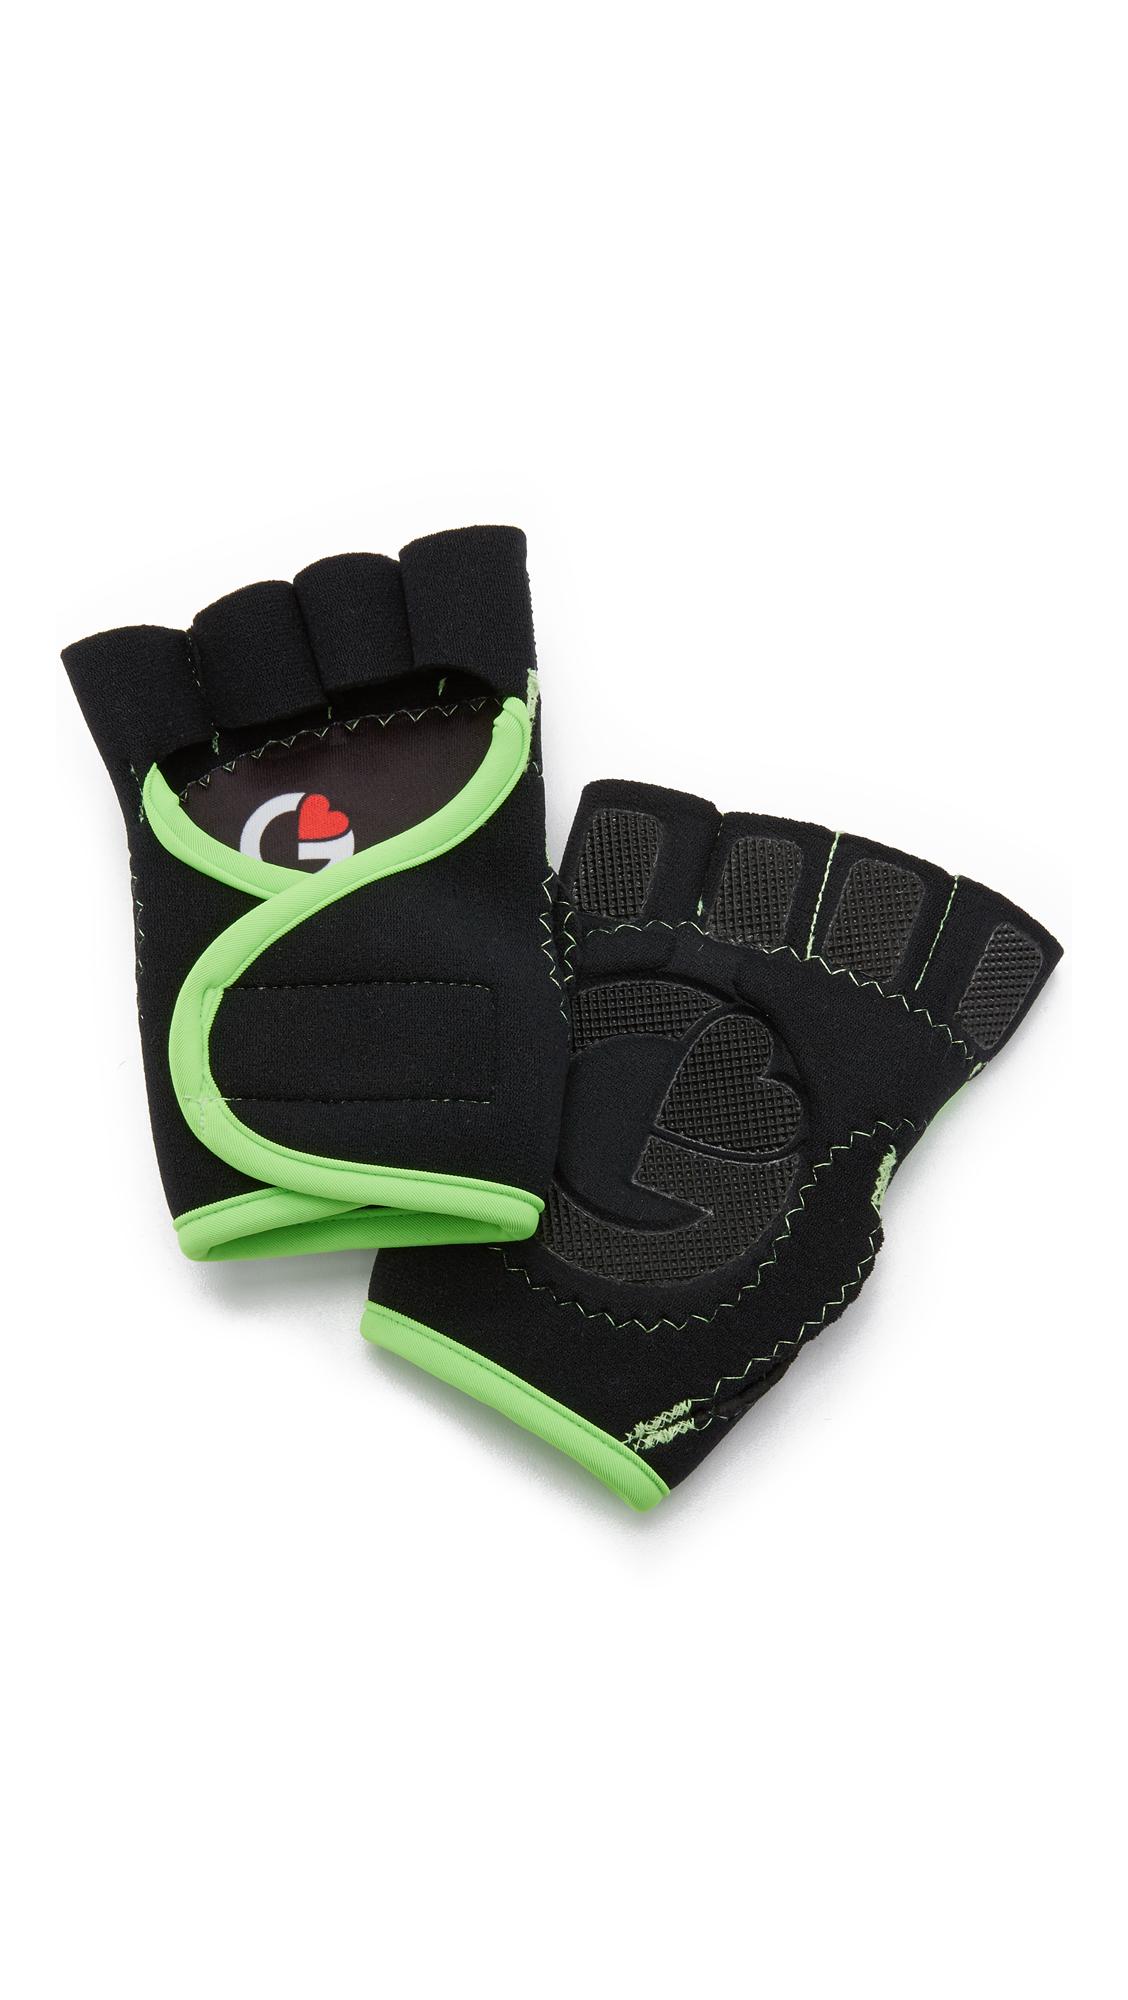 G-Loves Black With Lime Workout Gloves - Black/Lime at Shopbop